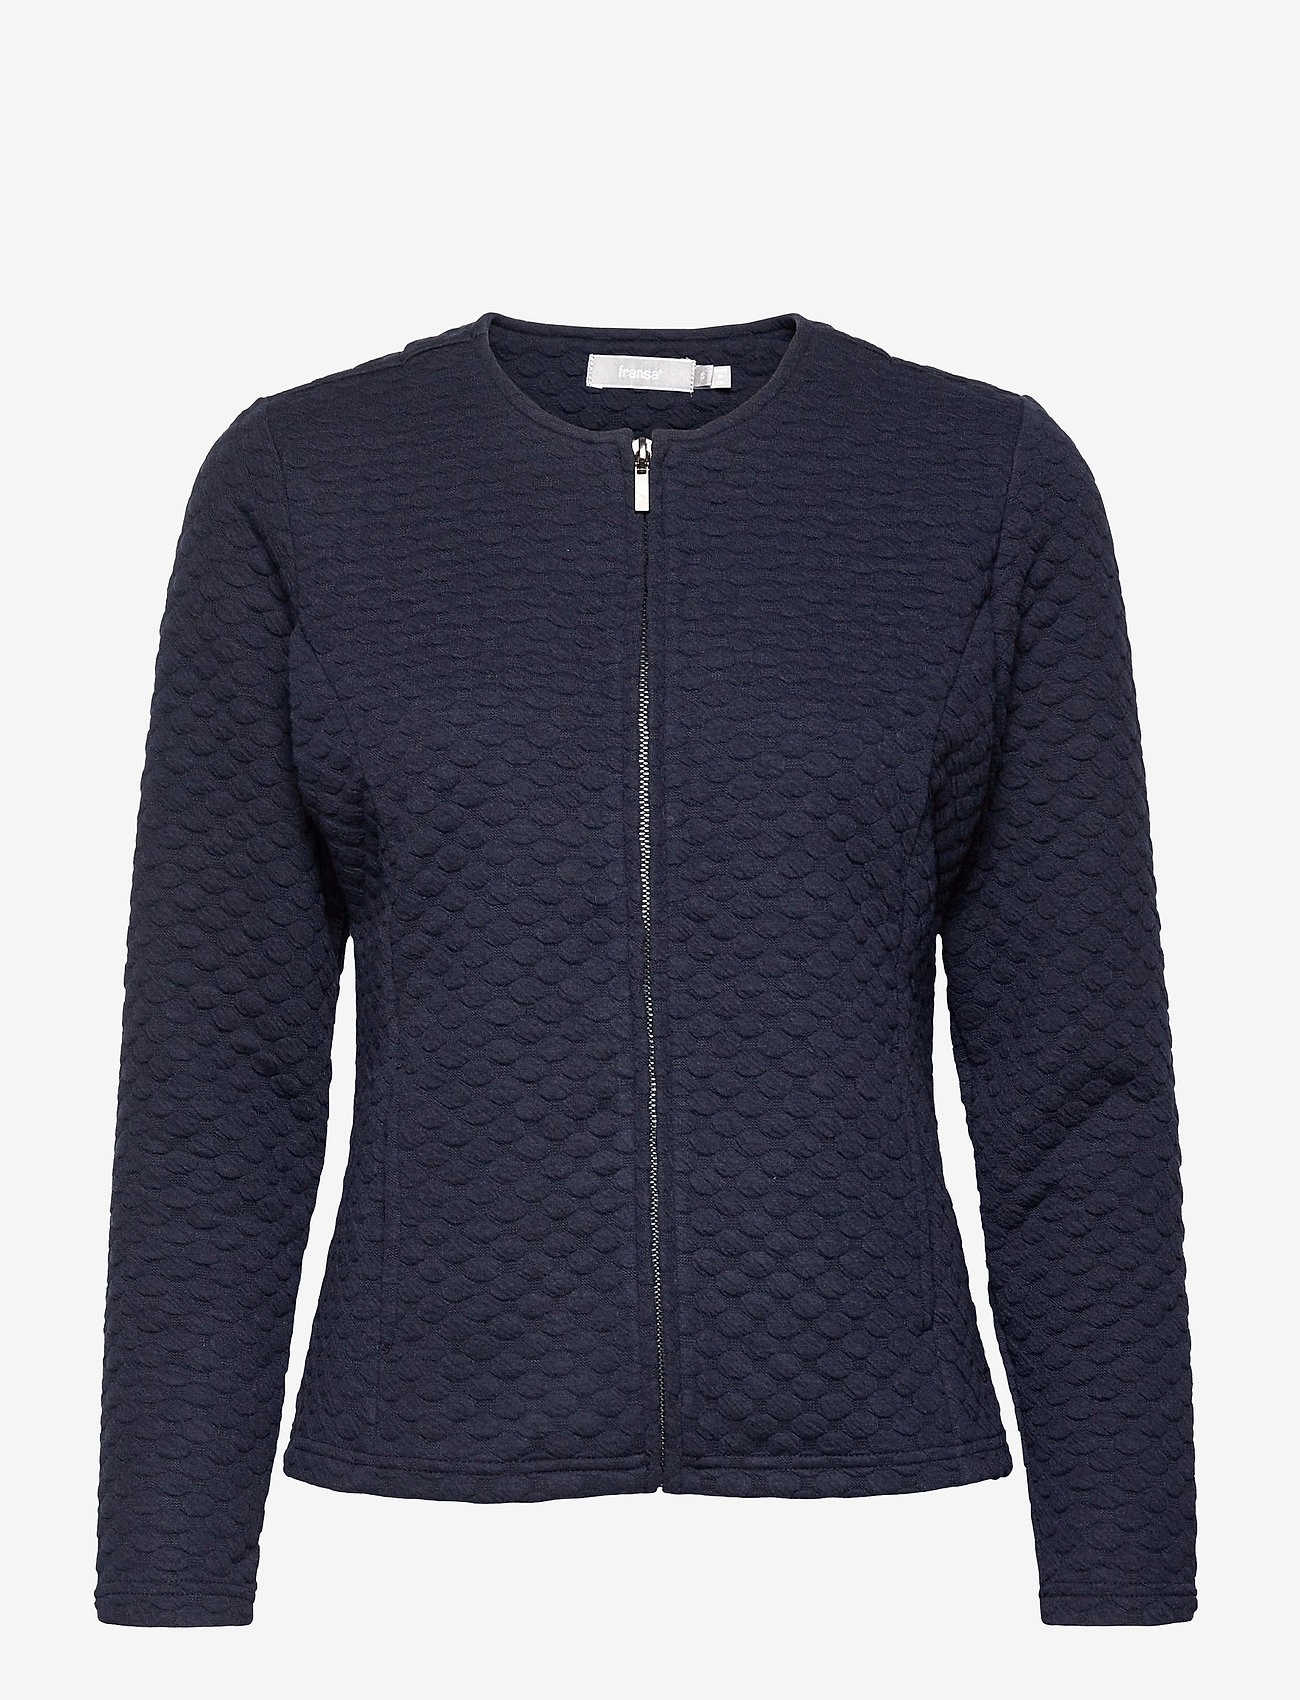 Fransa - FRPECARDI 1 Cardigan - cardigans - navy blazer - 0